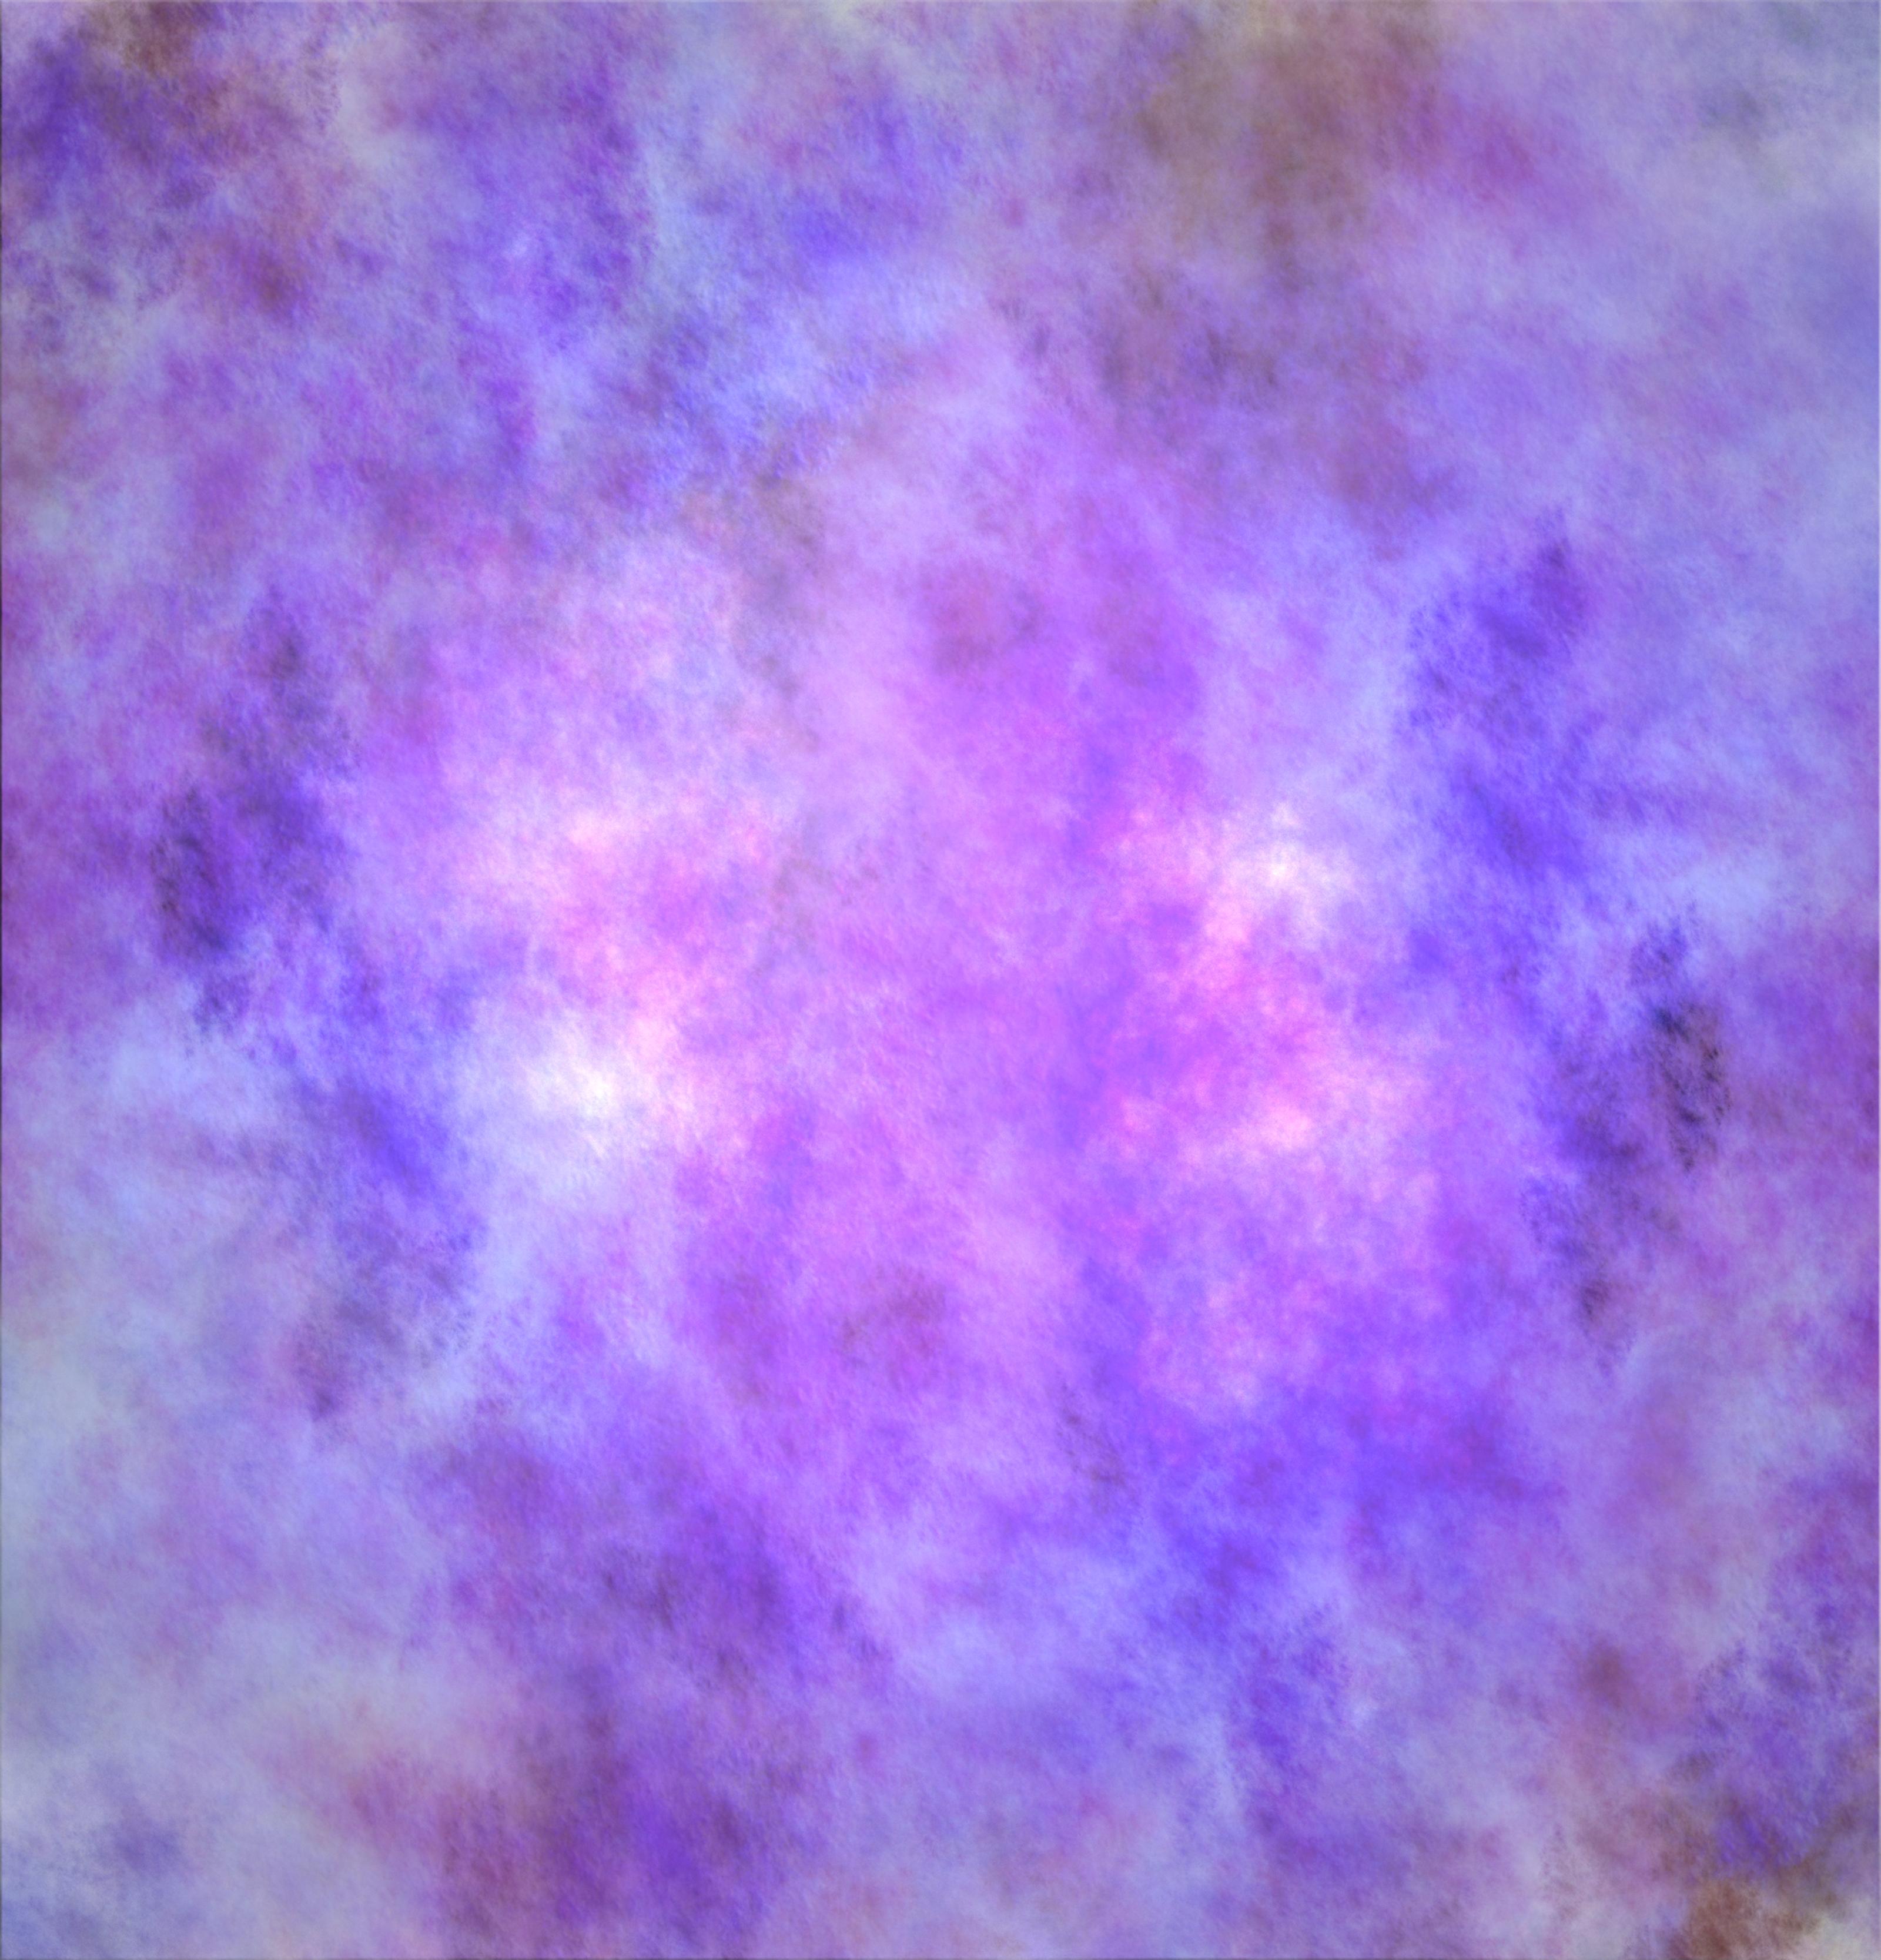 cloudy purple wallpaper - photo #5